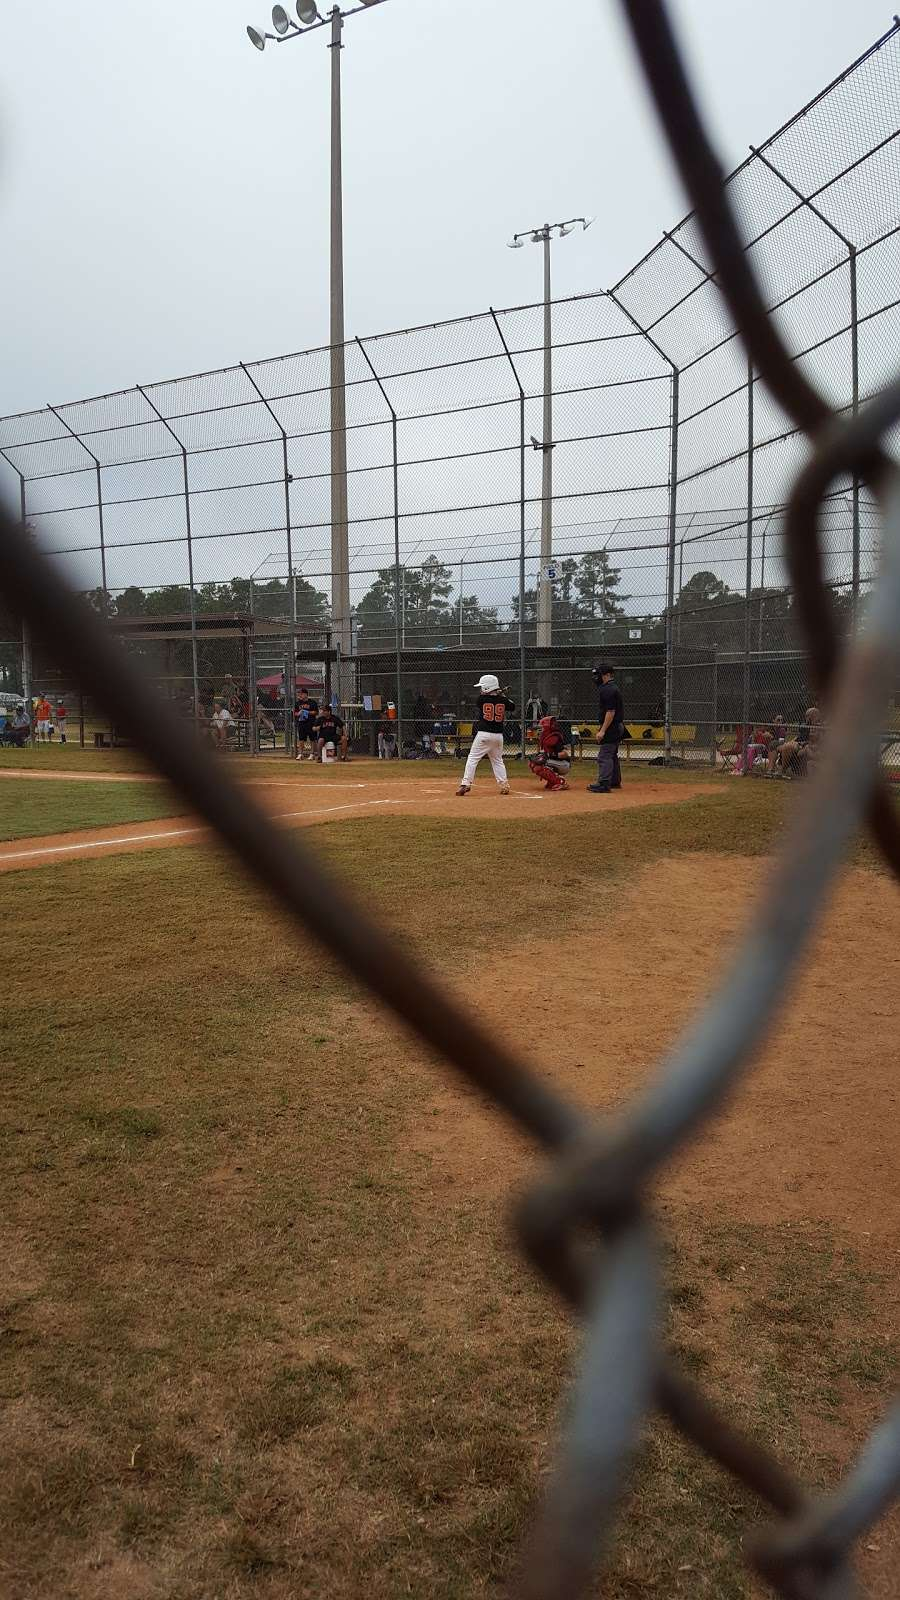 Rothwood Park Baseball - park    Photo 4 of 10   Address: 22430 Rothwood Rd, Spring, TX 77389, USA